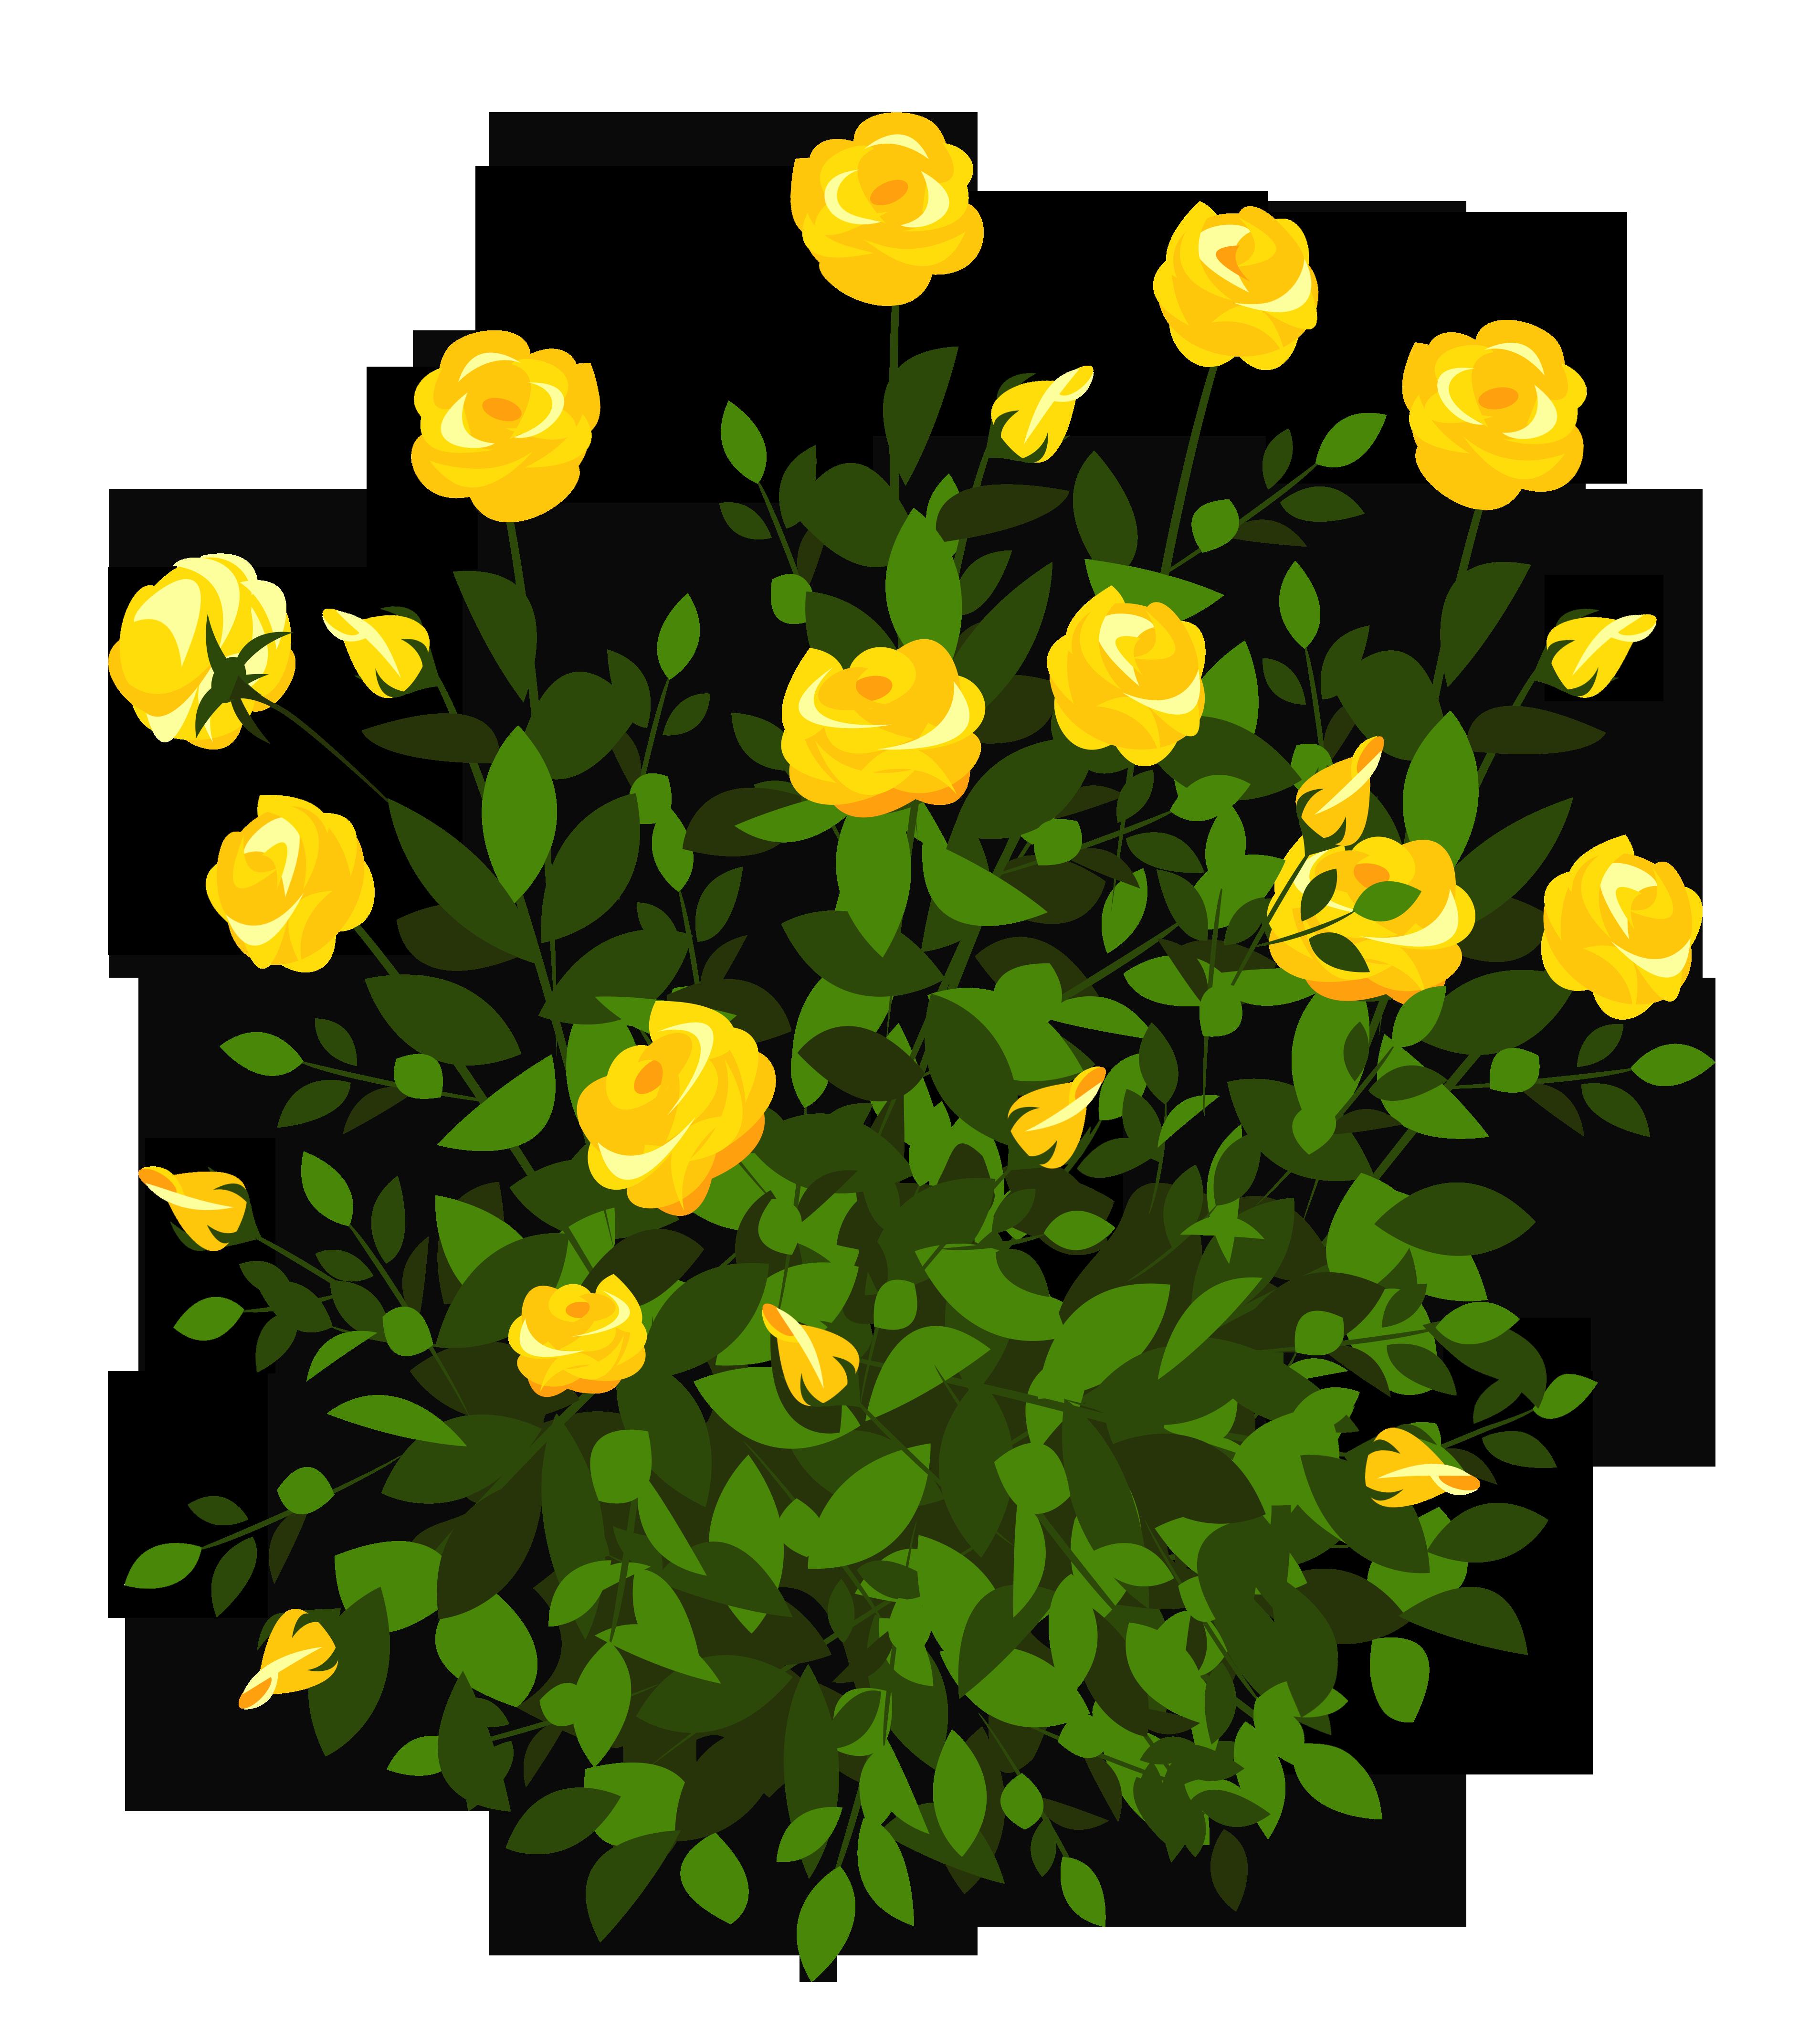 Rose clipart rose plant #9